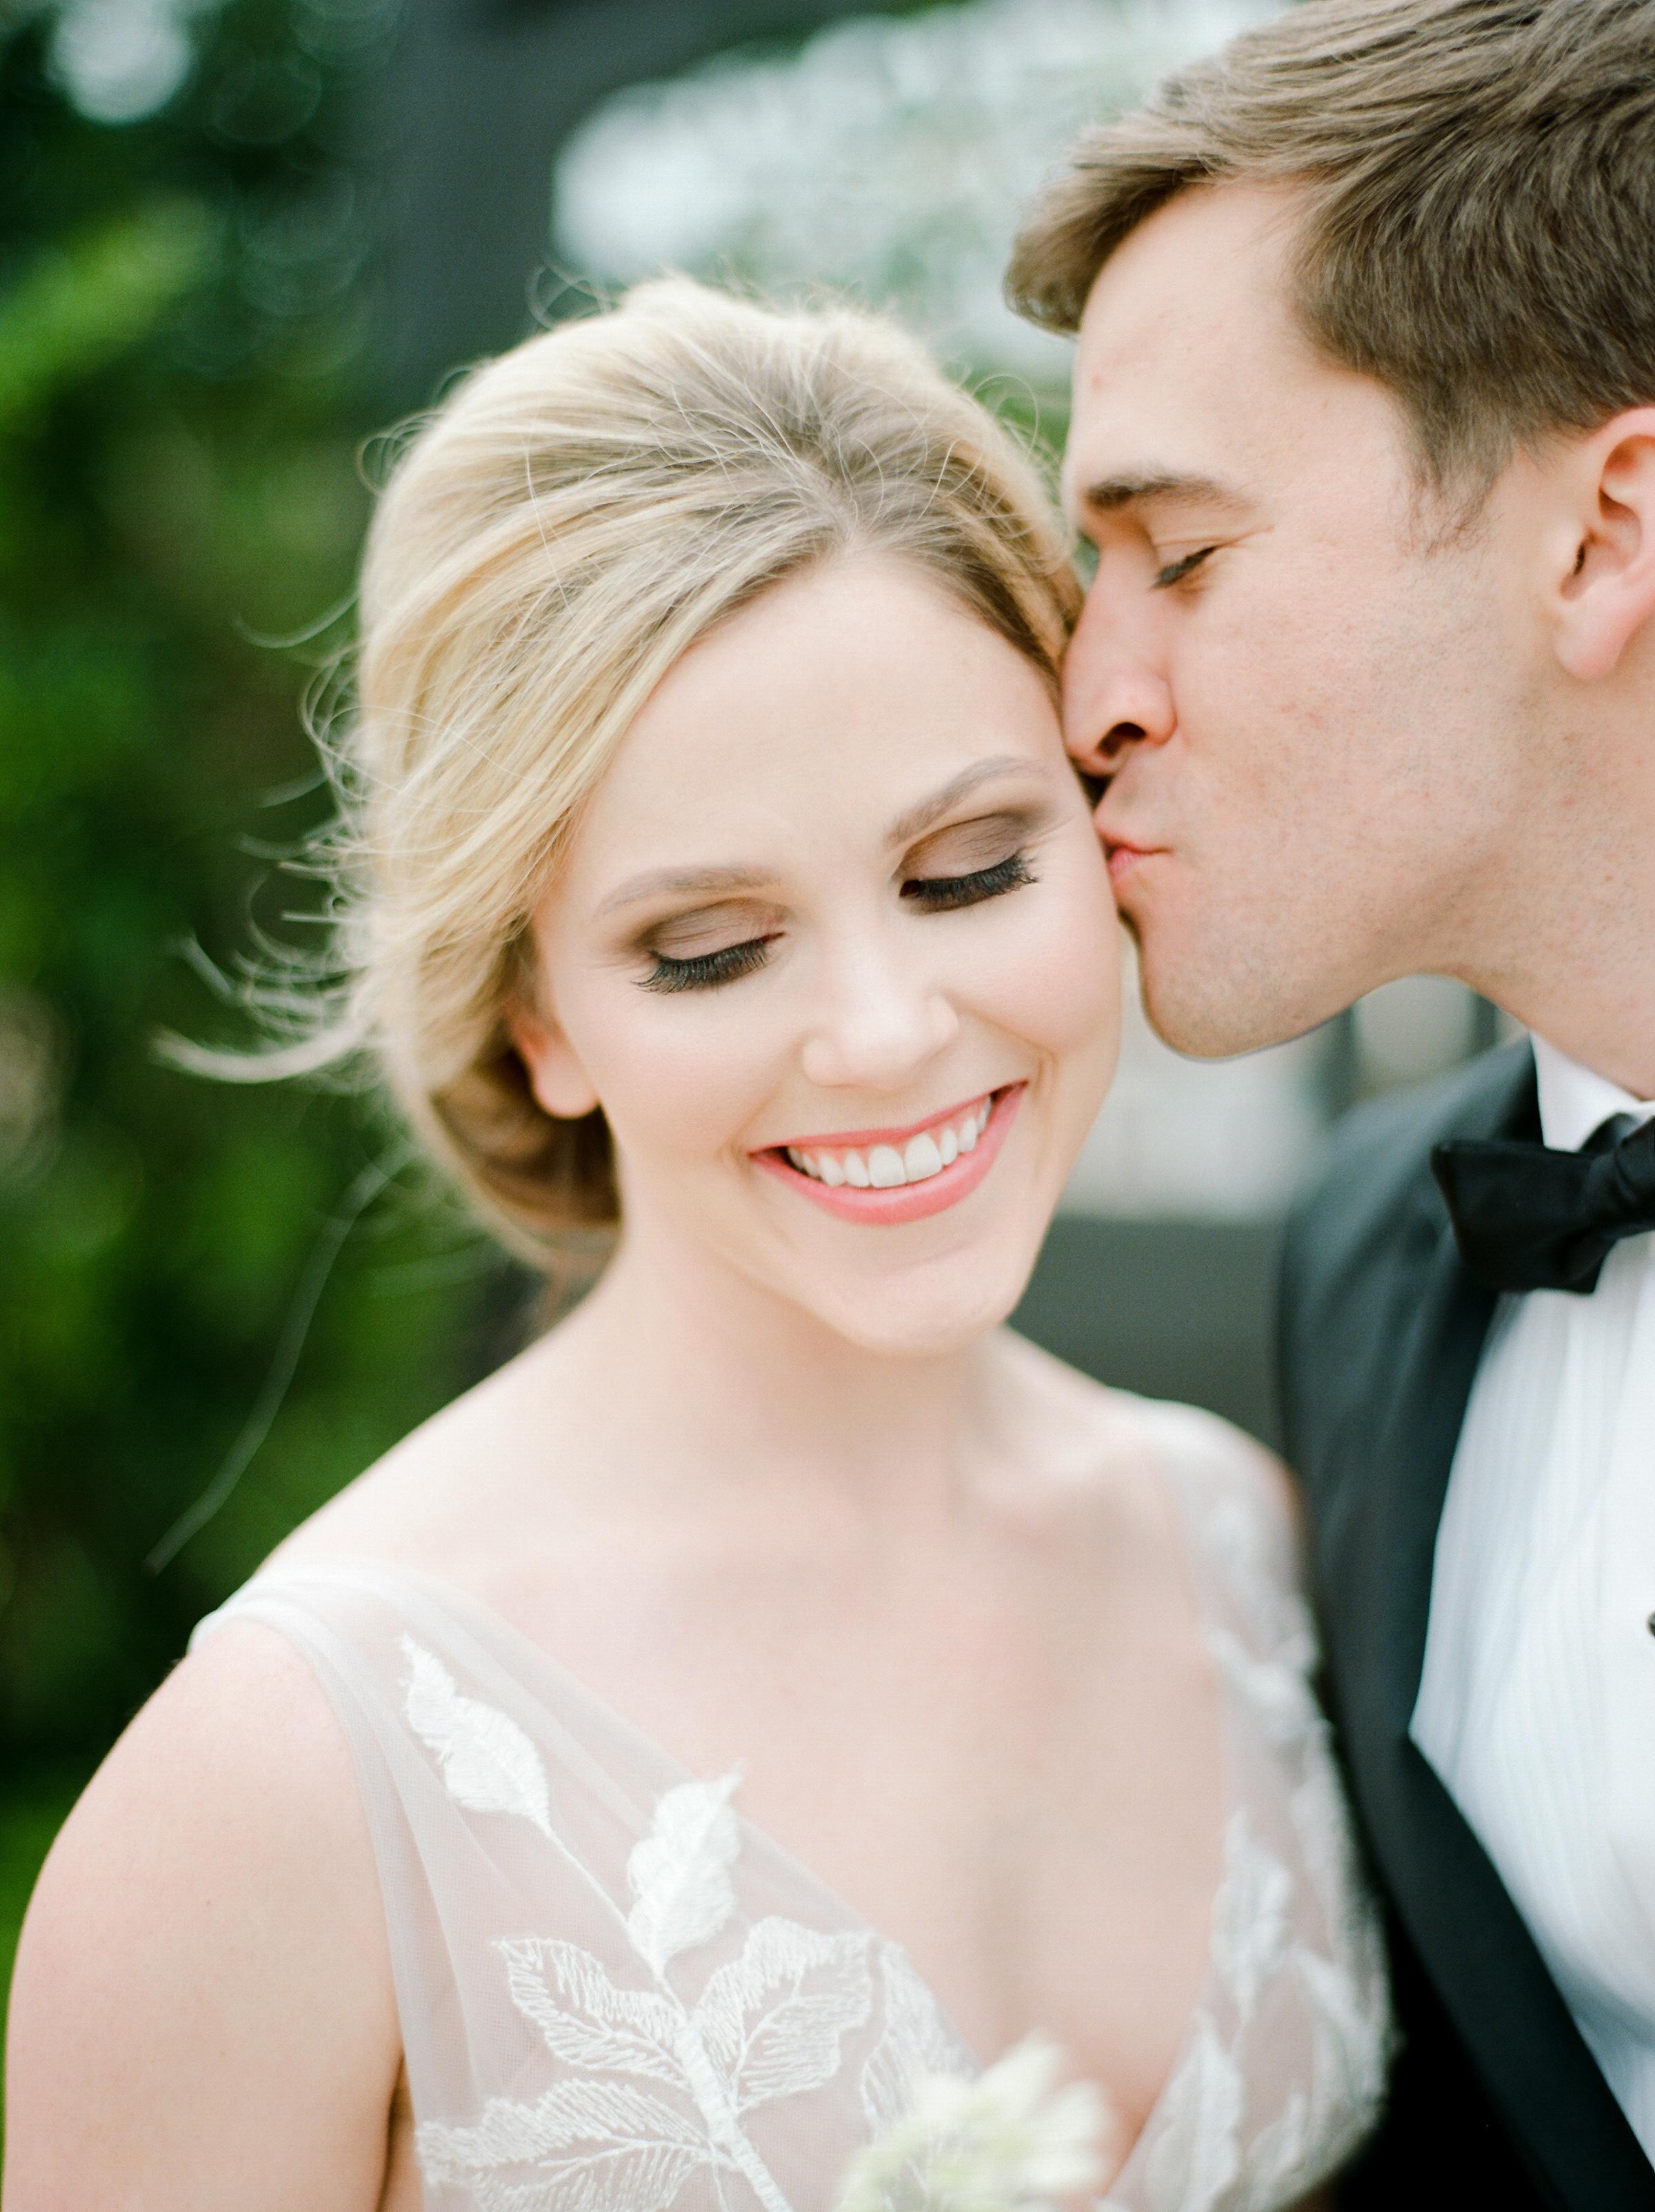 McGovern-Centennial-Gardens-Houston-Texas-Wedding-Venue-Josh-Dana-Fernandez-Photography-Film-Destination-Fine-Art-Luxury-Top-Best-Austin-Dallas-Magnolia-Rouge-Jennifer-Laura-Design-209.jpg